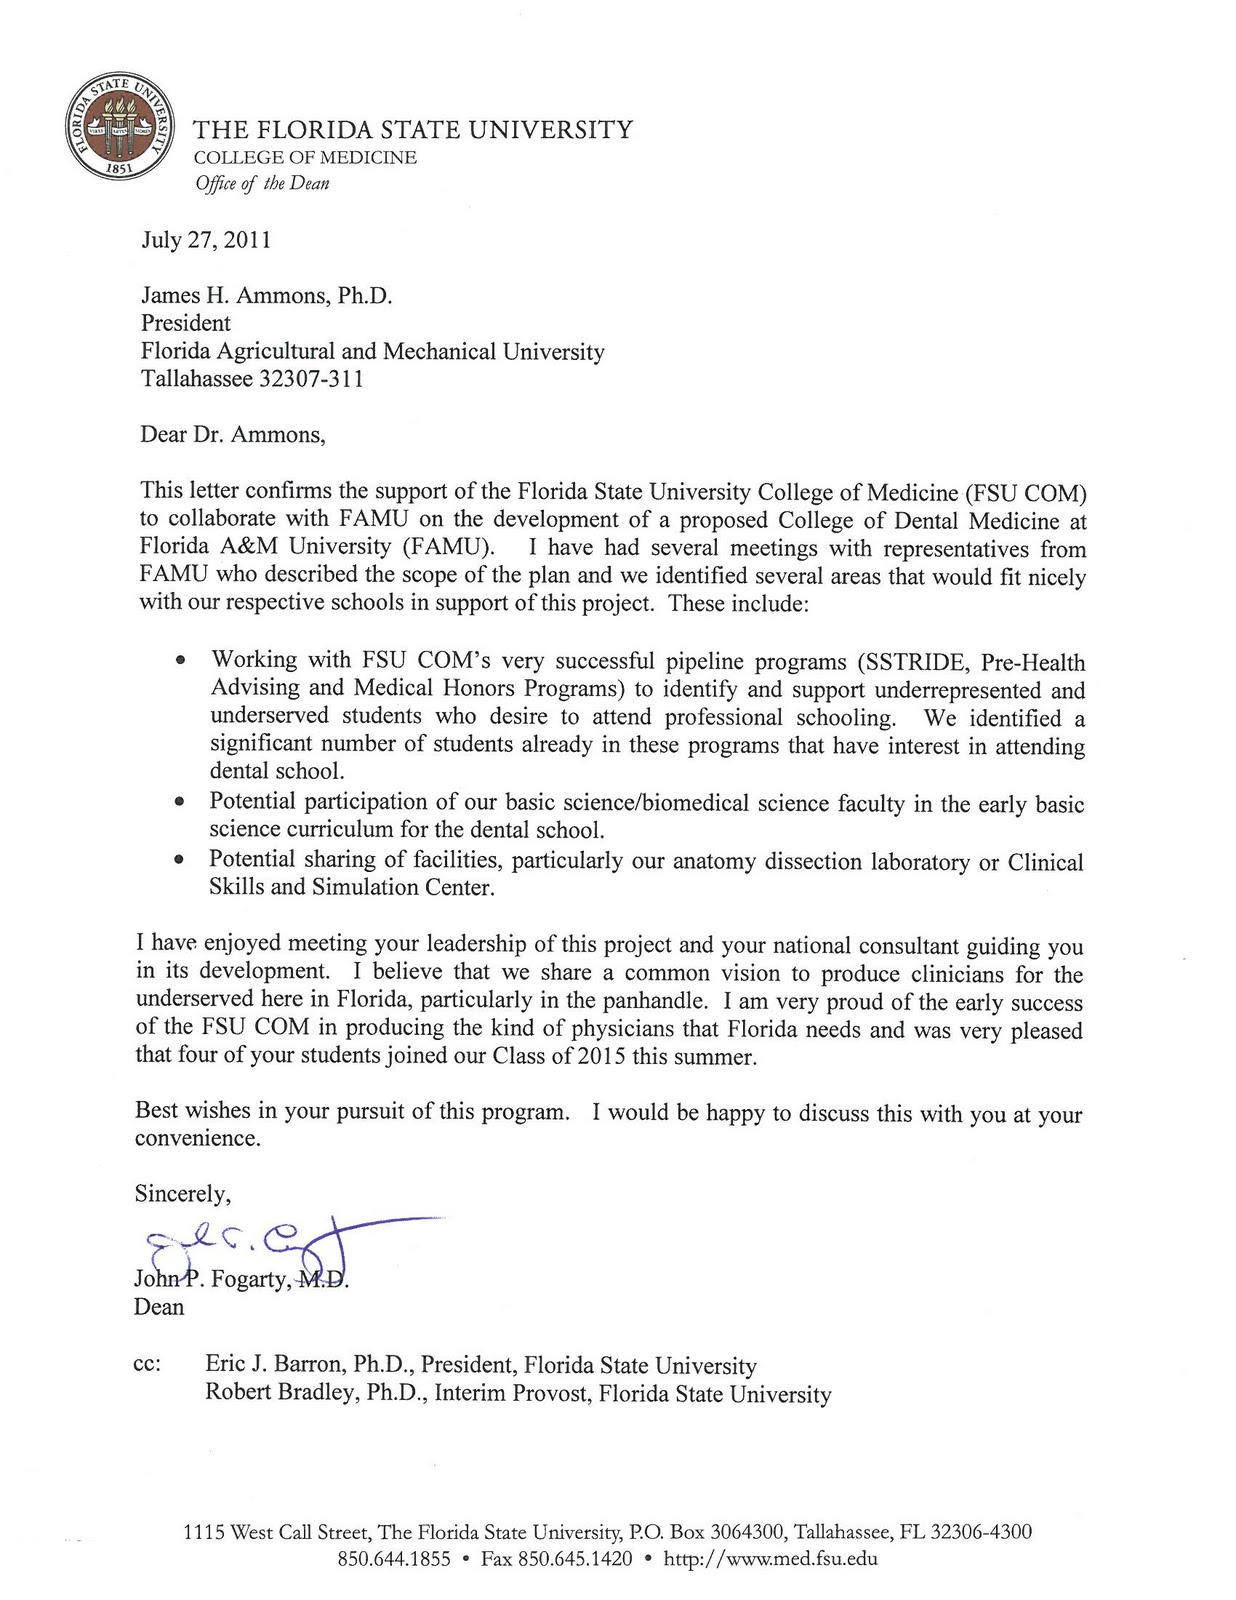 fsu application essay uf essay cover letter examples uf sample